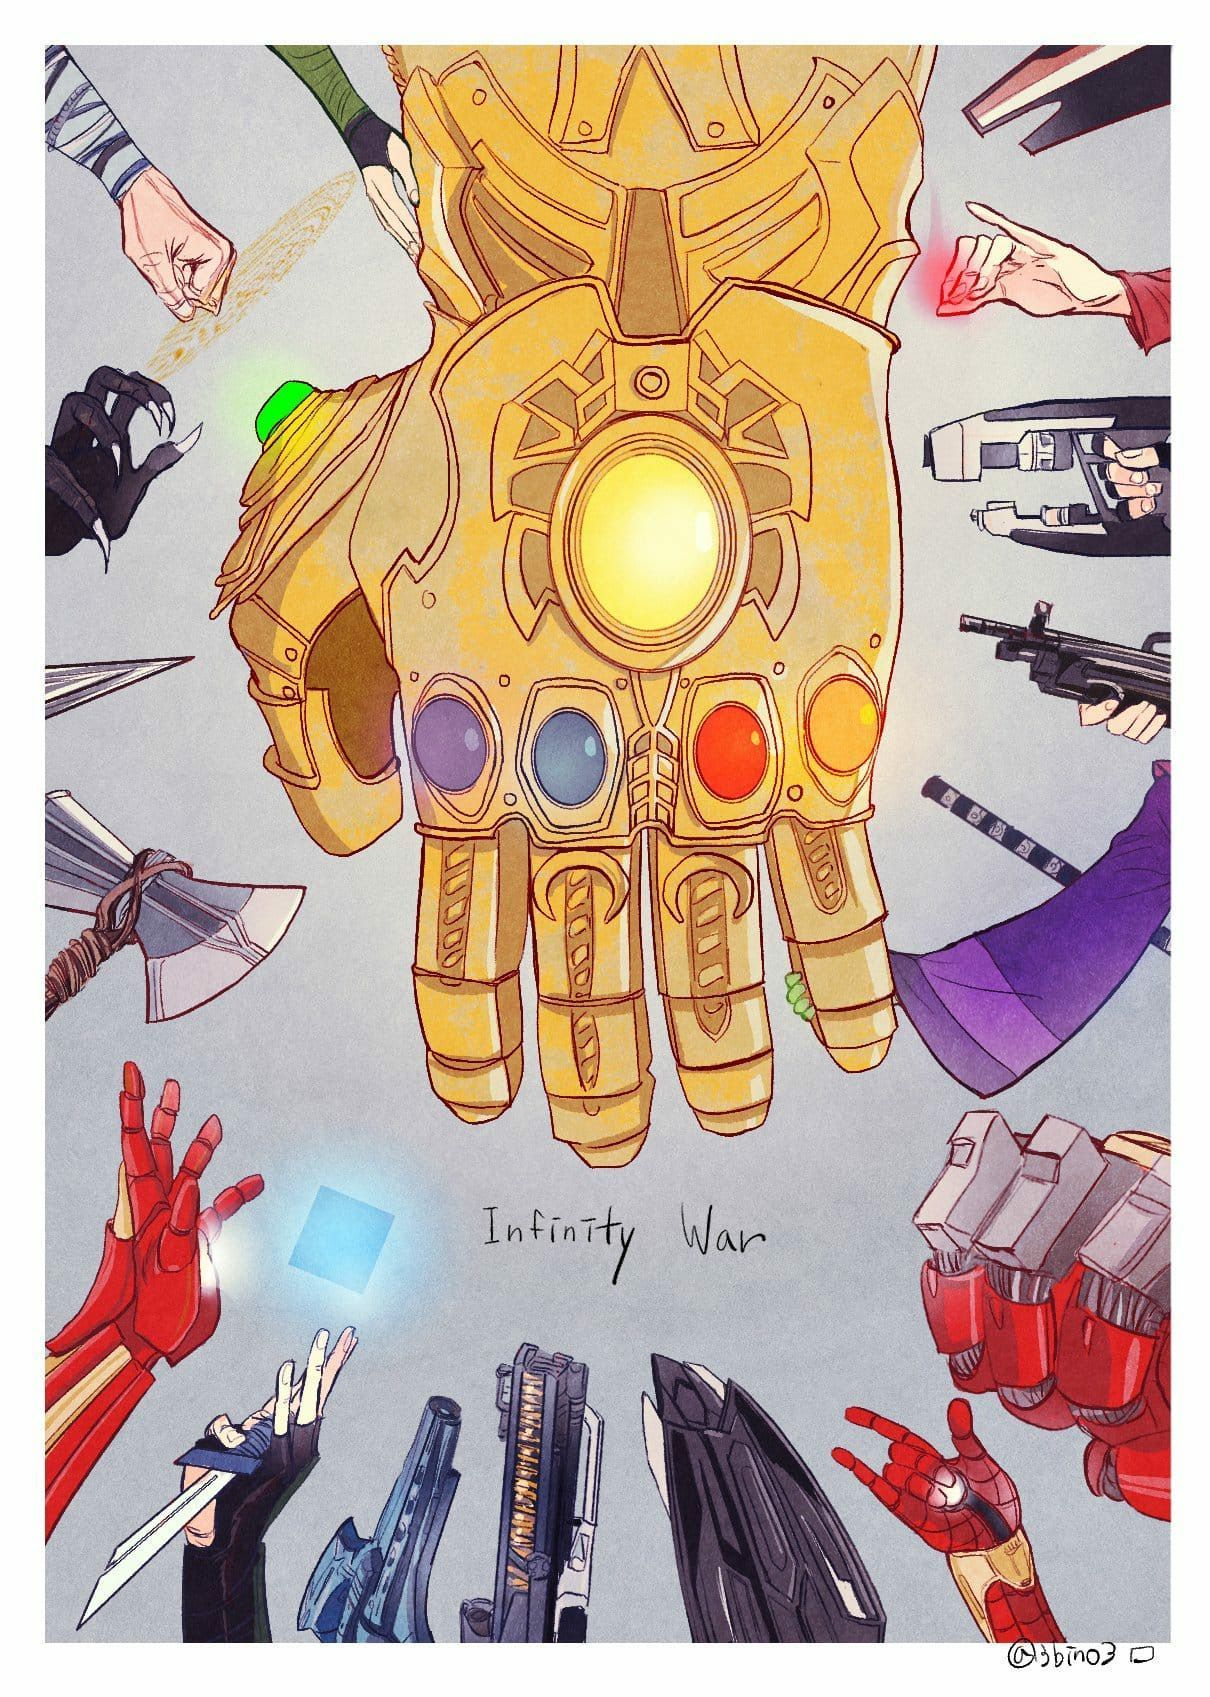 All Couple Avengers - Infinity war team?!囧rz